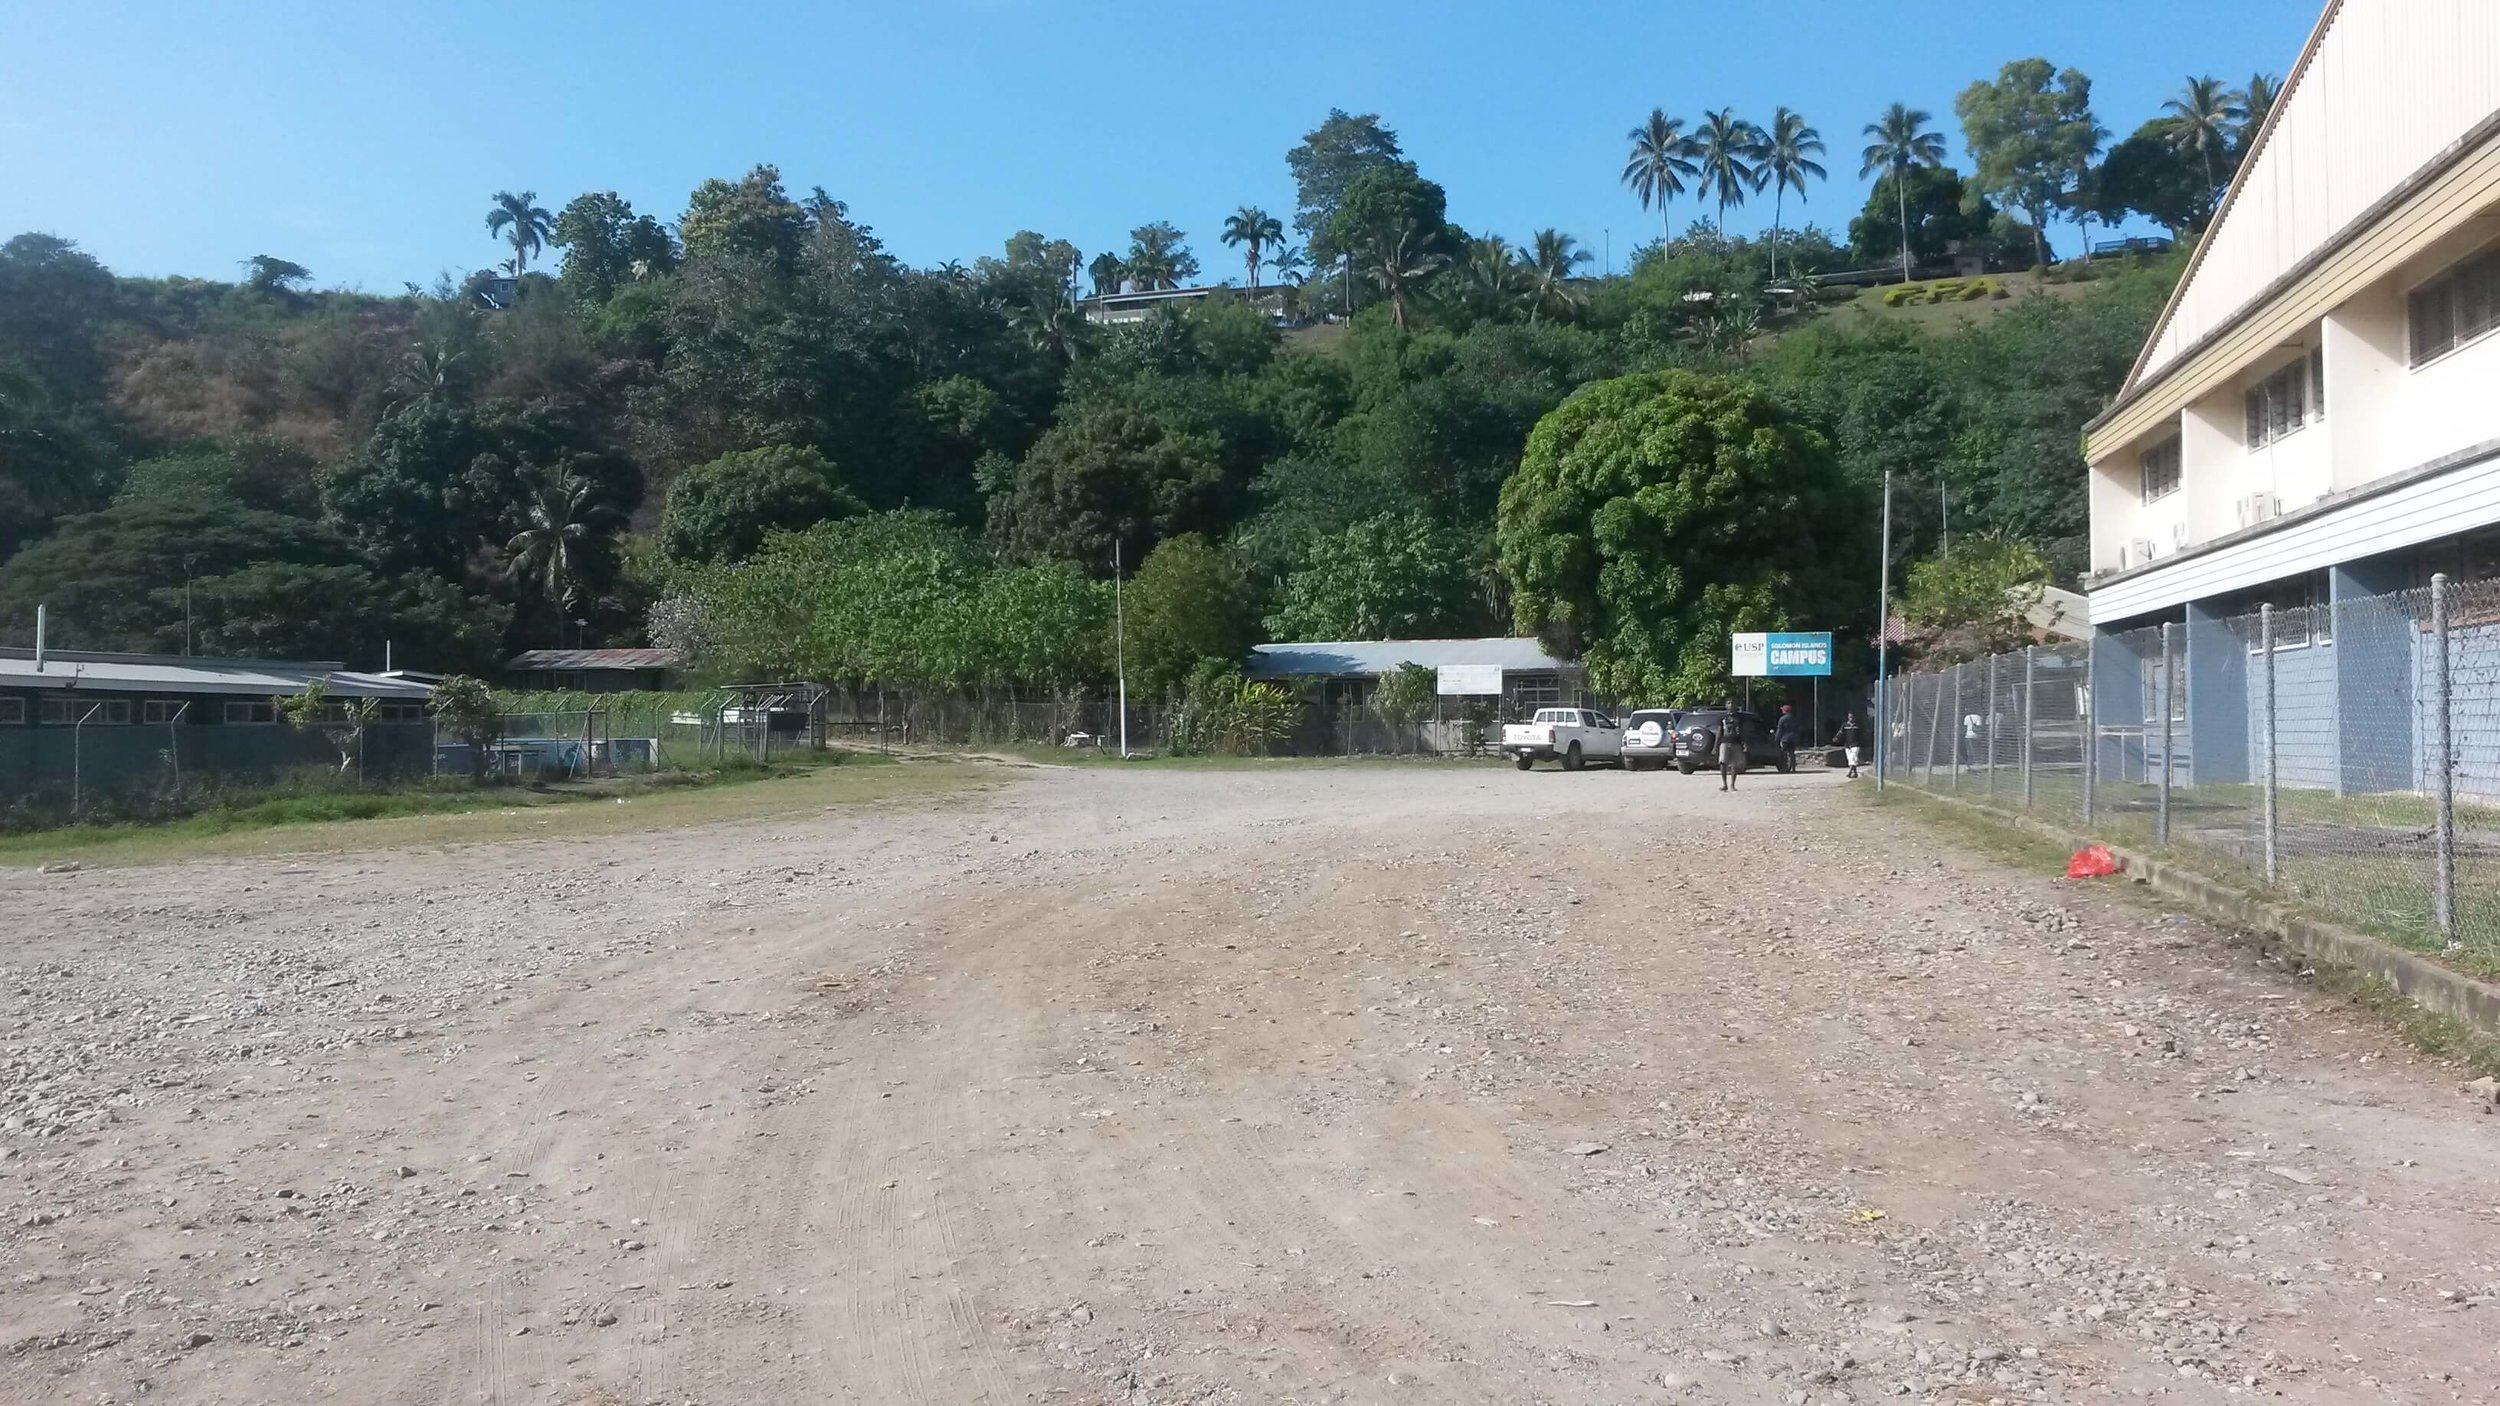 Site selected for development, Honiara, Solomon Islands  Credit: Block by Block team